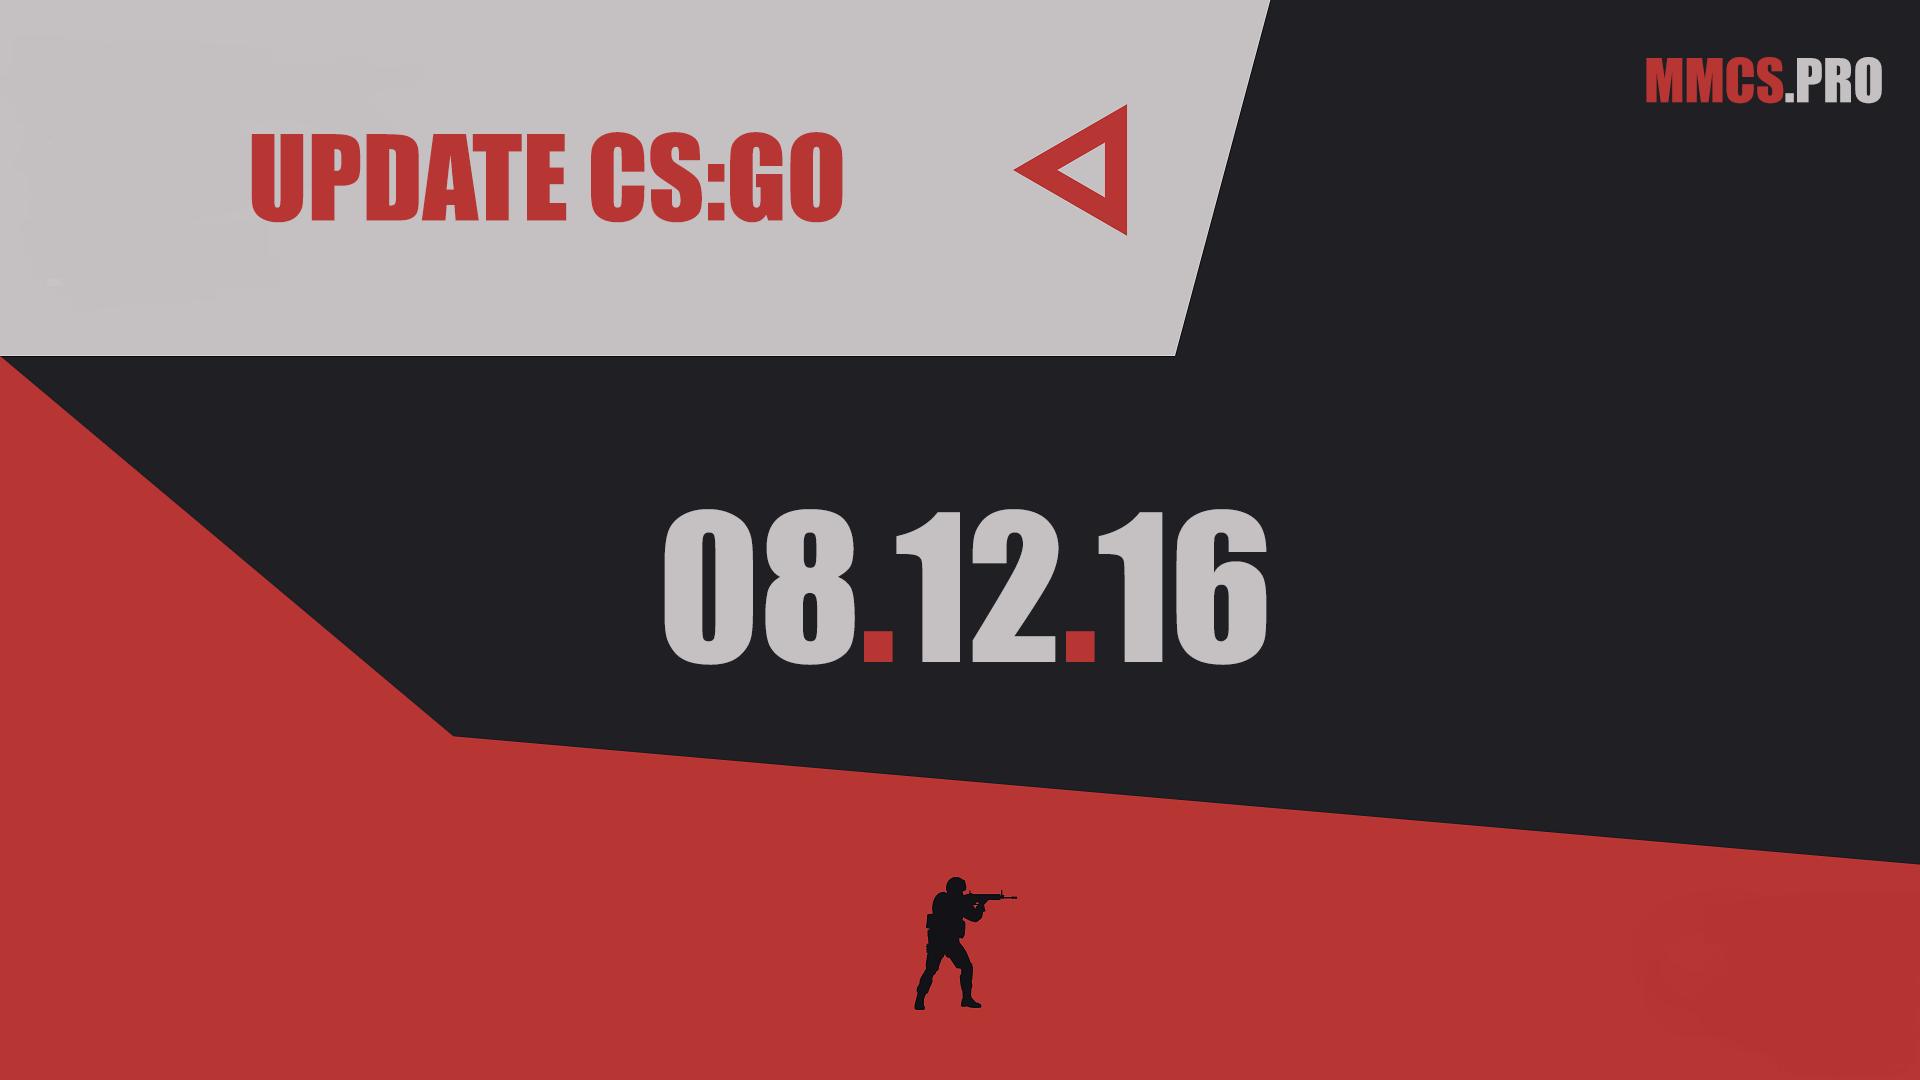 https://mmcs.pro/update-csgo-08-12-2016-valve/